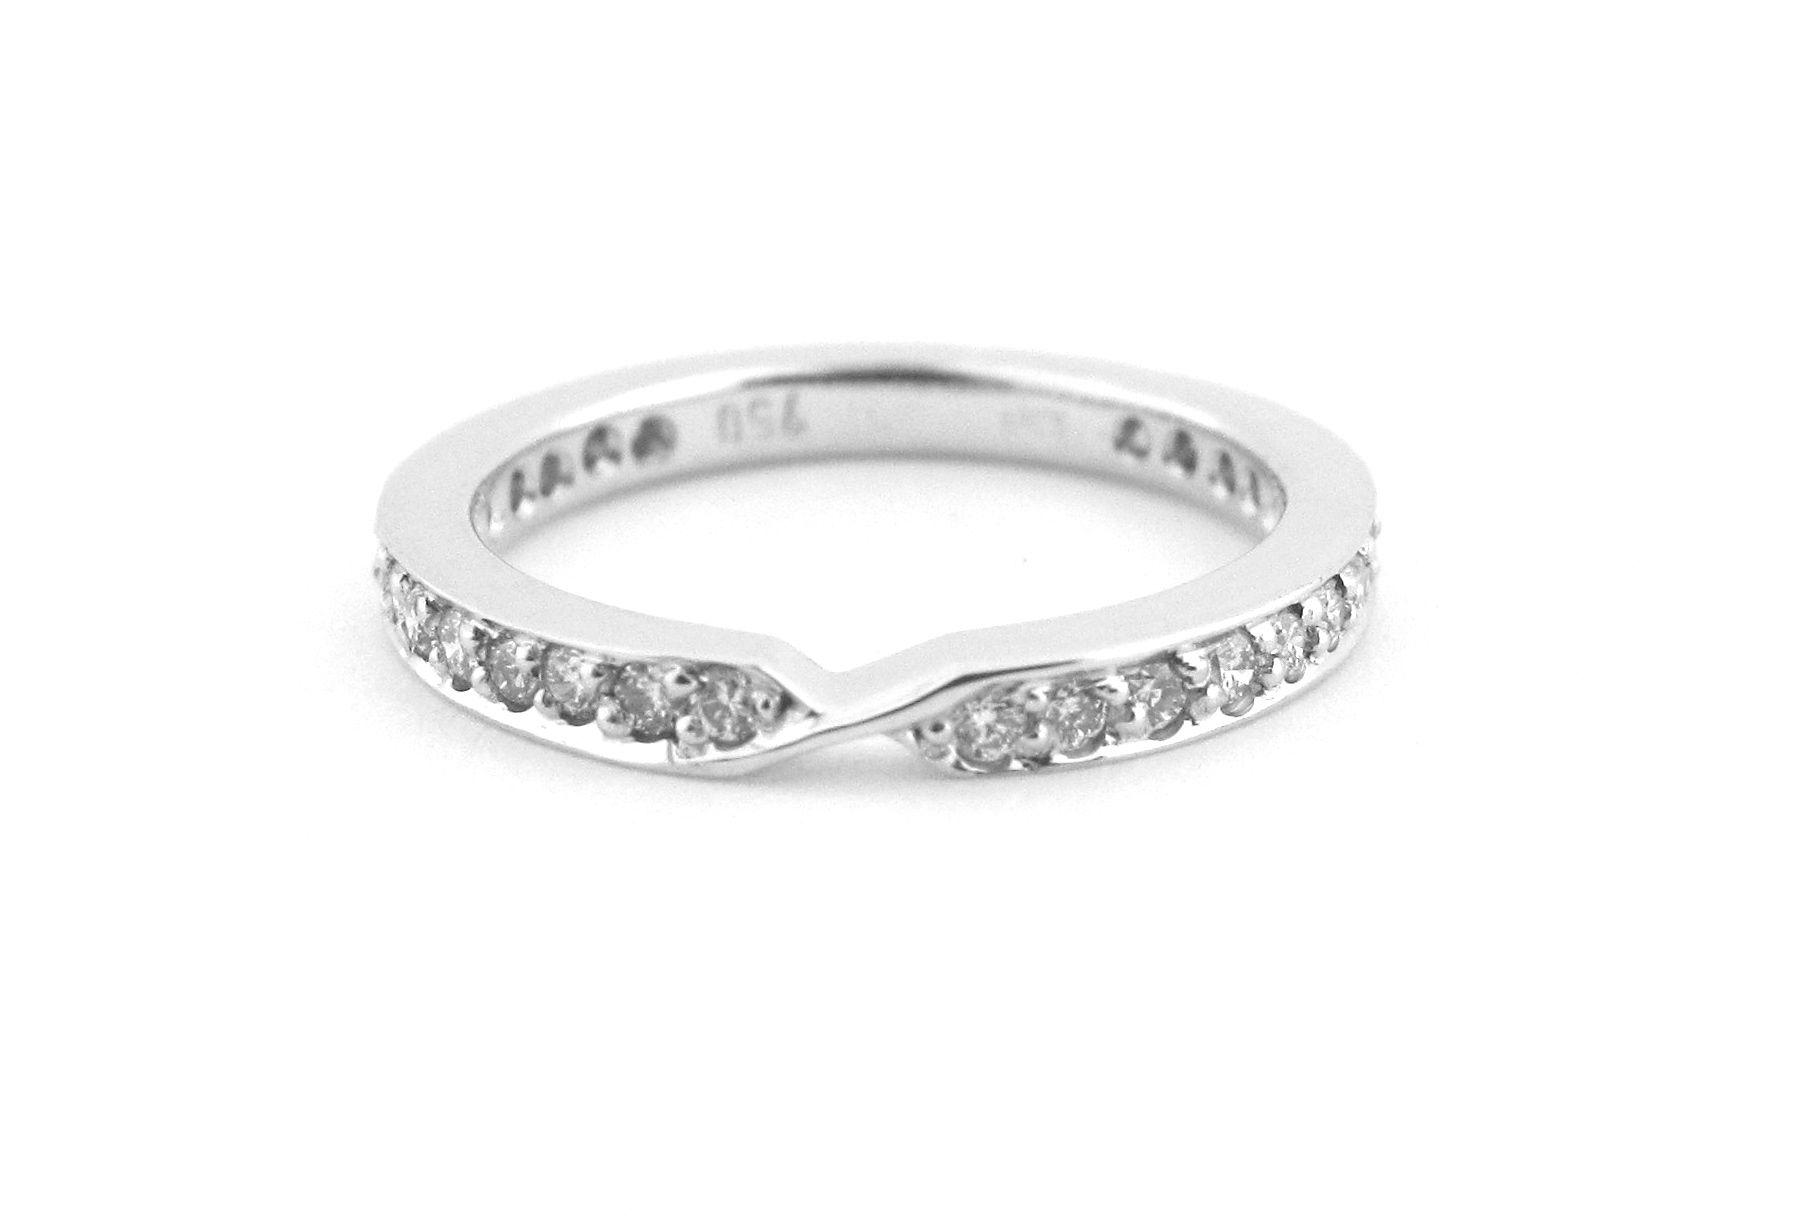 18ct White Gold Handmade Wedding Band With Bead Set Diamonds Www Maxdiamonds Com Au Maxdiamonds Wedding Rings For Women Handmade Wedding Band Wedding Rings